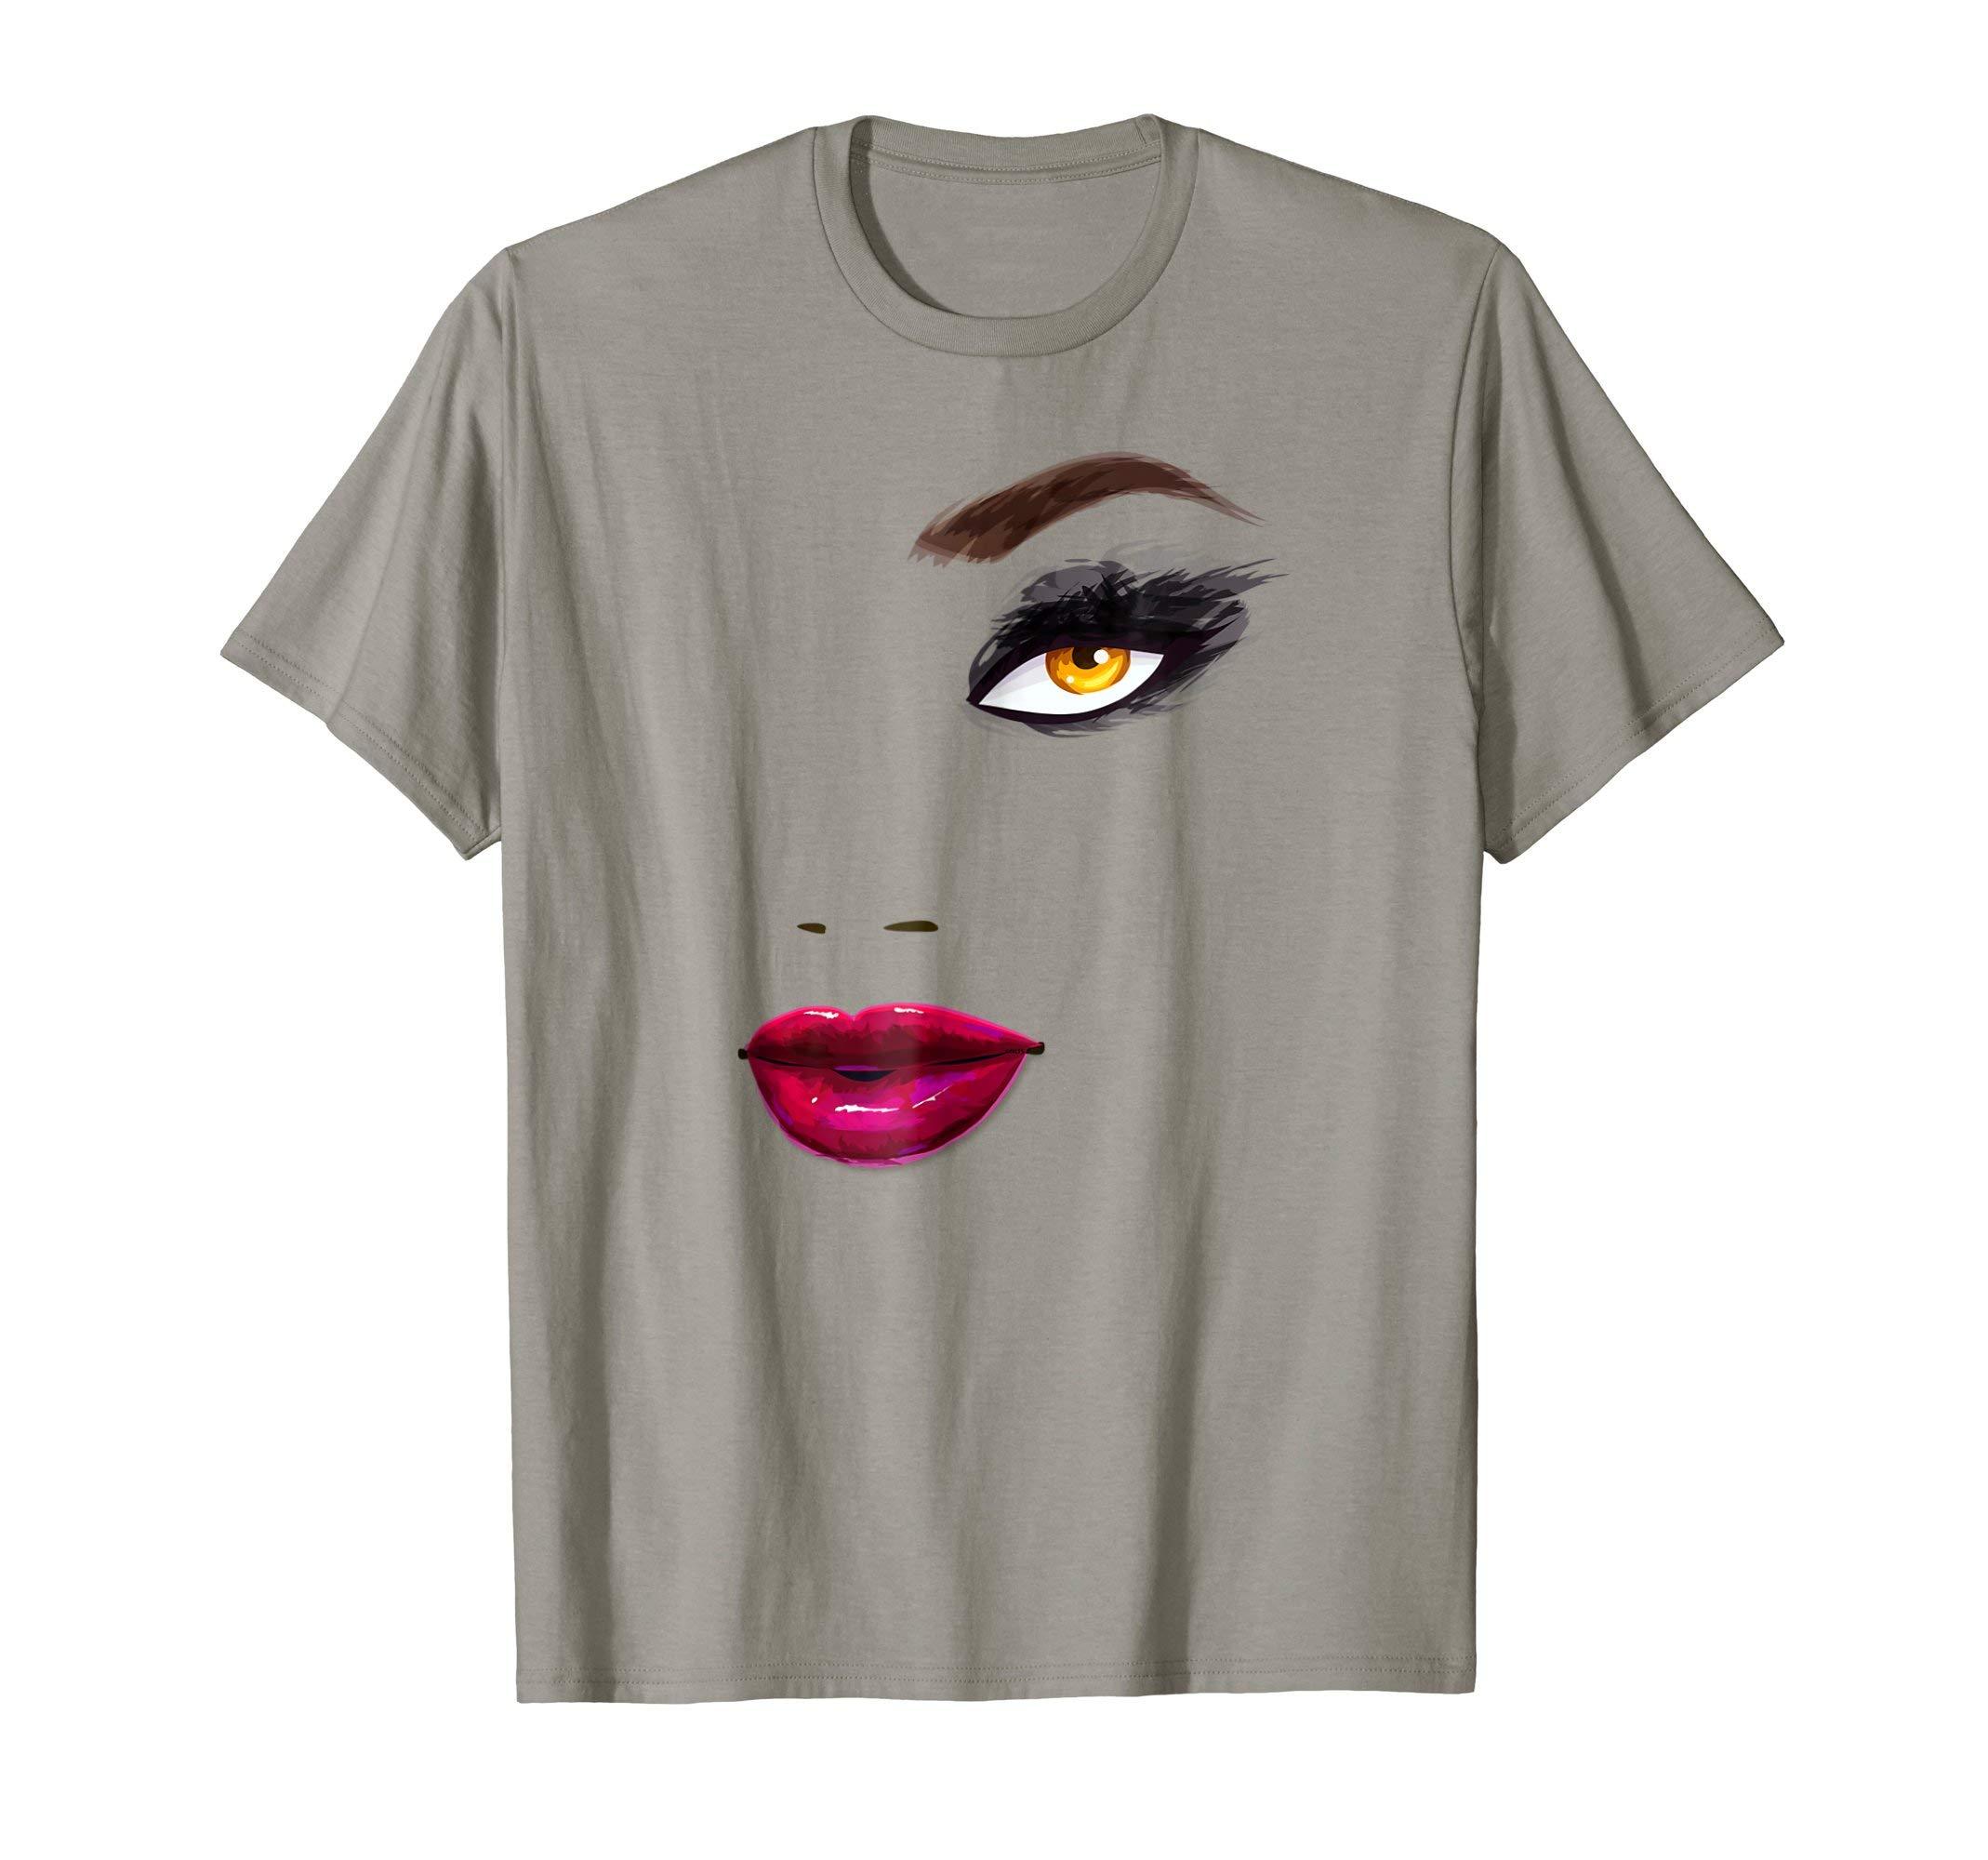 Eyelashes-Makeup-In-Vogue-t-shirt-Lips-Print-Shirt-Top